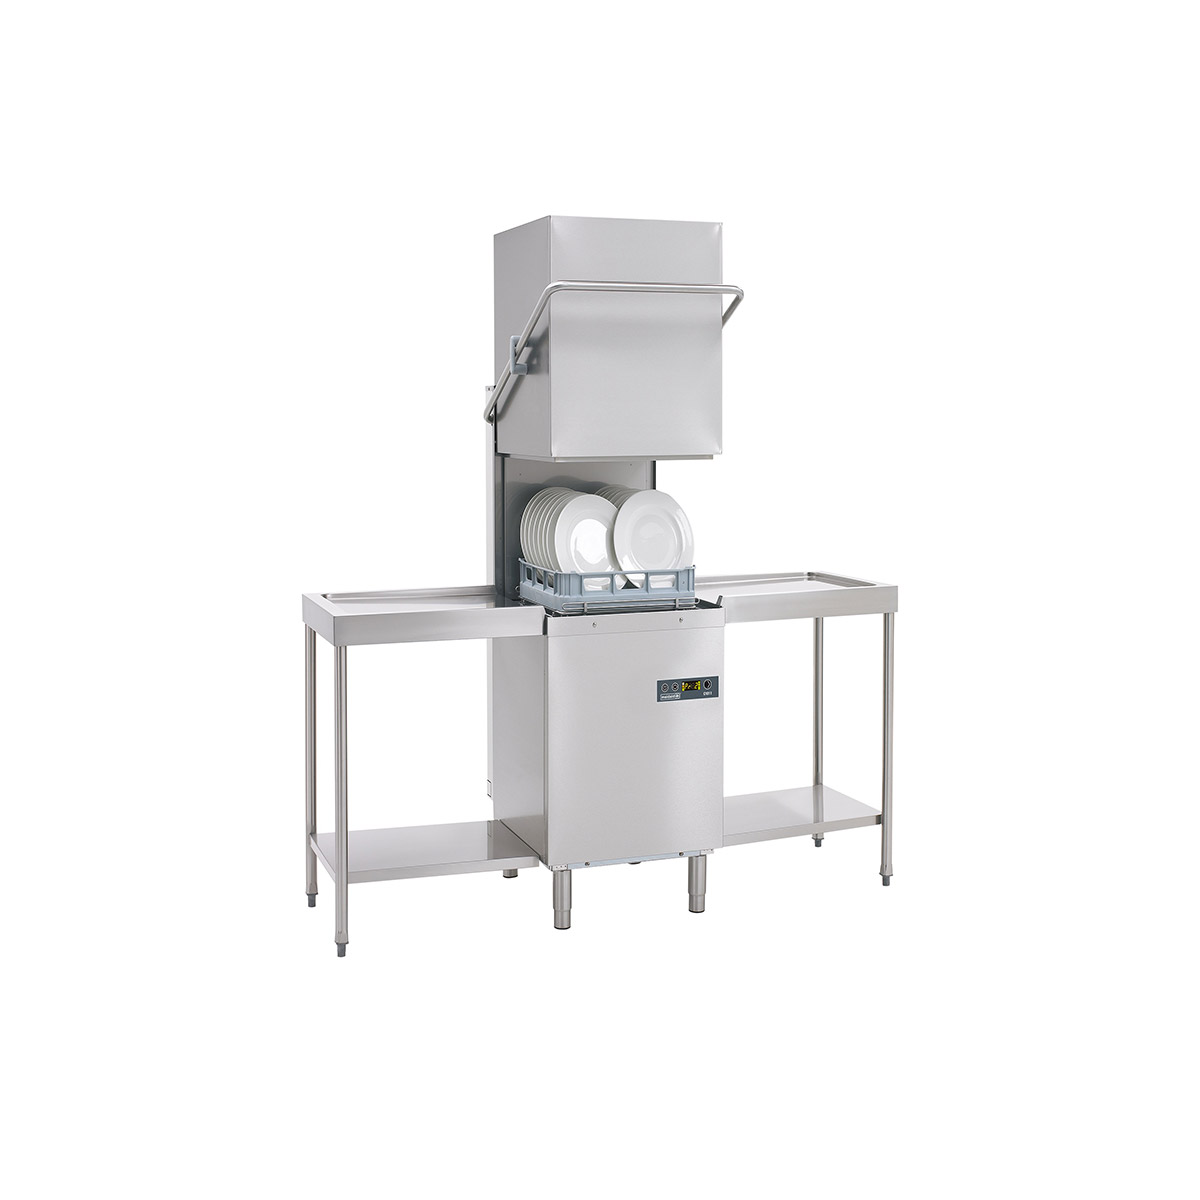 Maidaid Halcyon Passthrough Dishwasher C1011